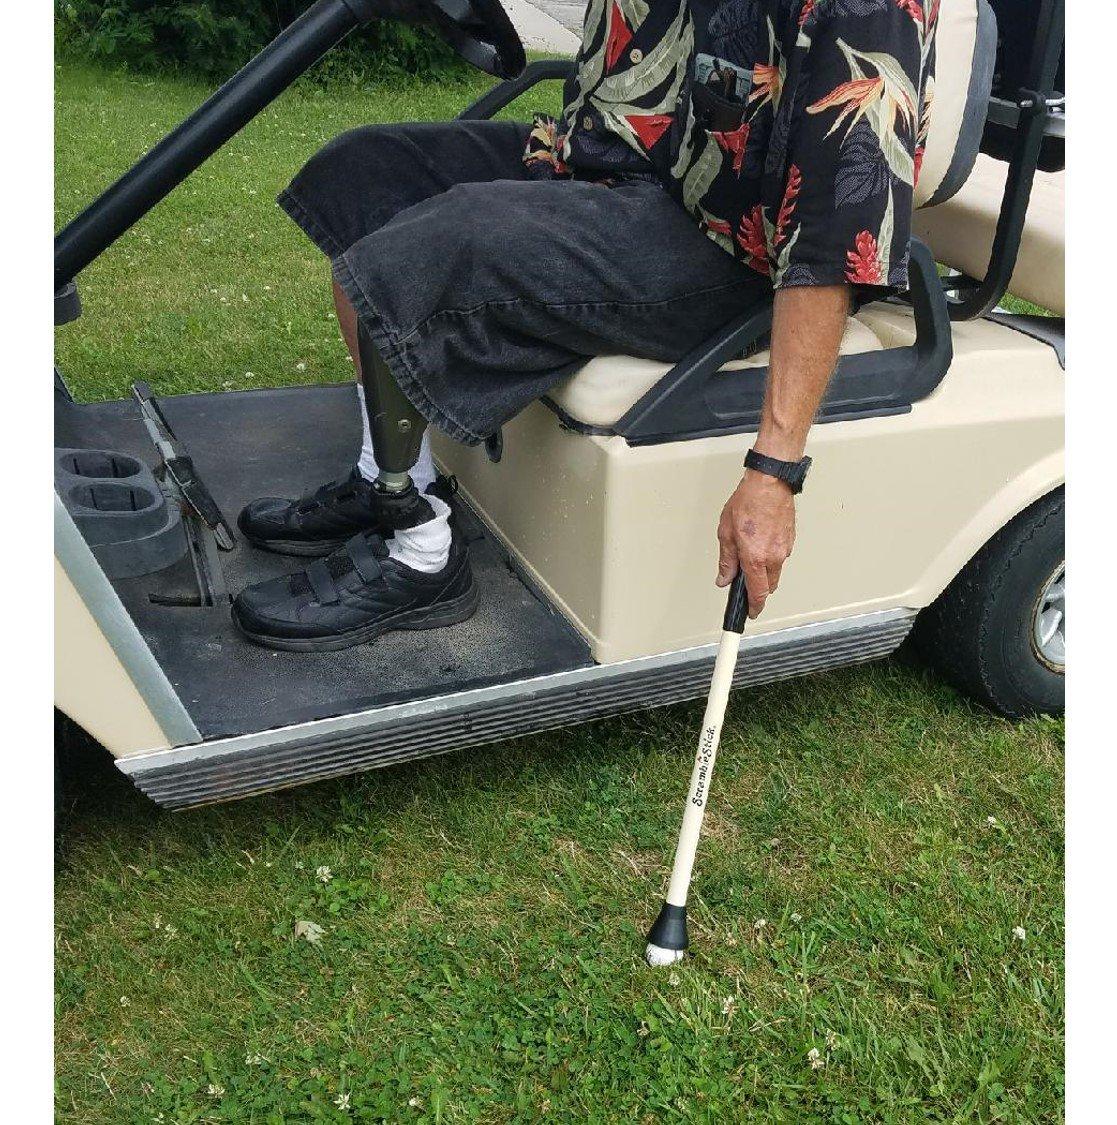 Scramble Stick The Original Shorty Golf Ball Retriever, Lightweight Design, 20-inch, 2-Pack by Scramble Stick (Image #2)